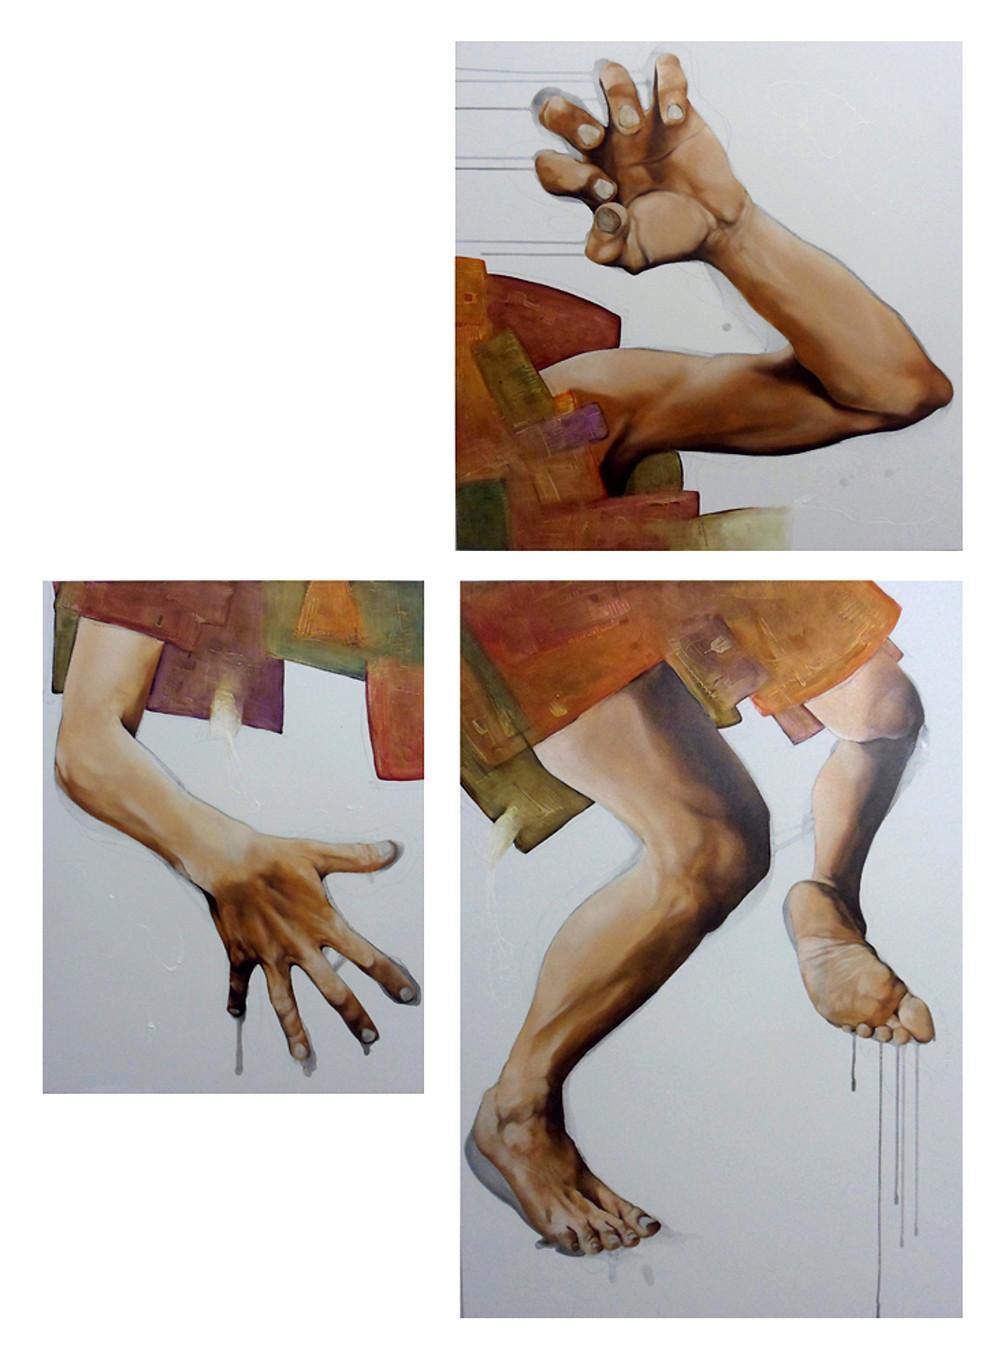 La vittima - Mauro Molle